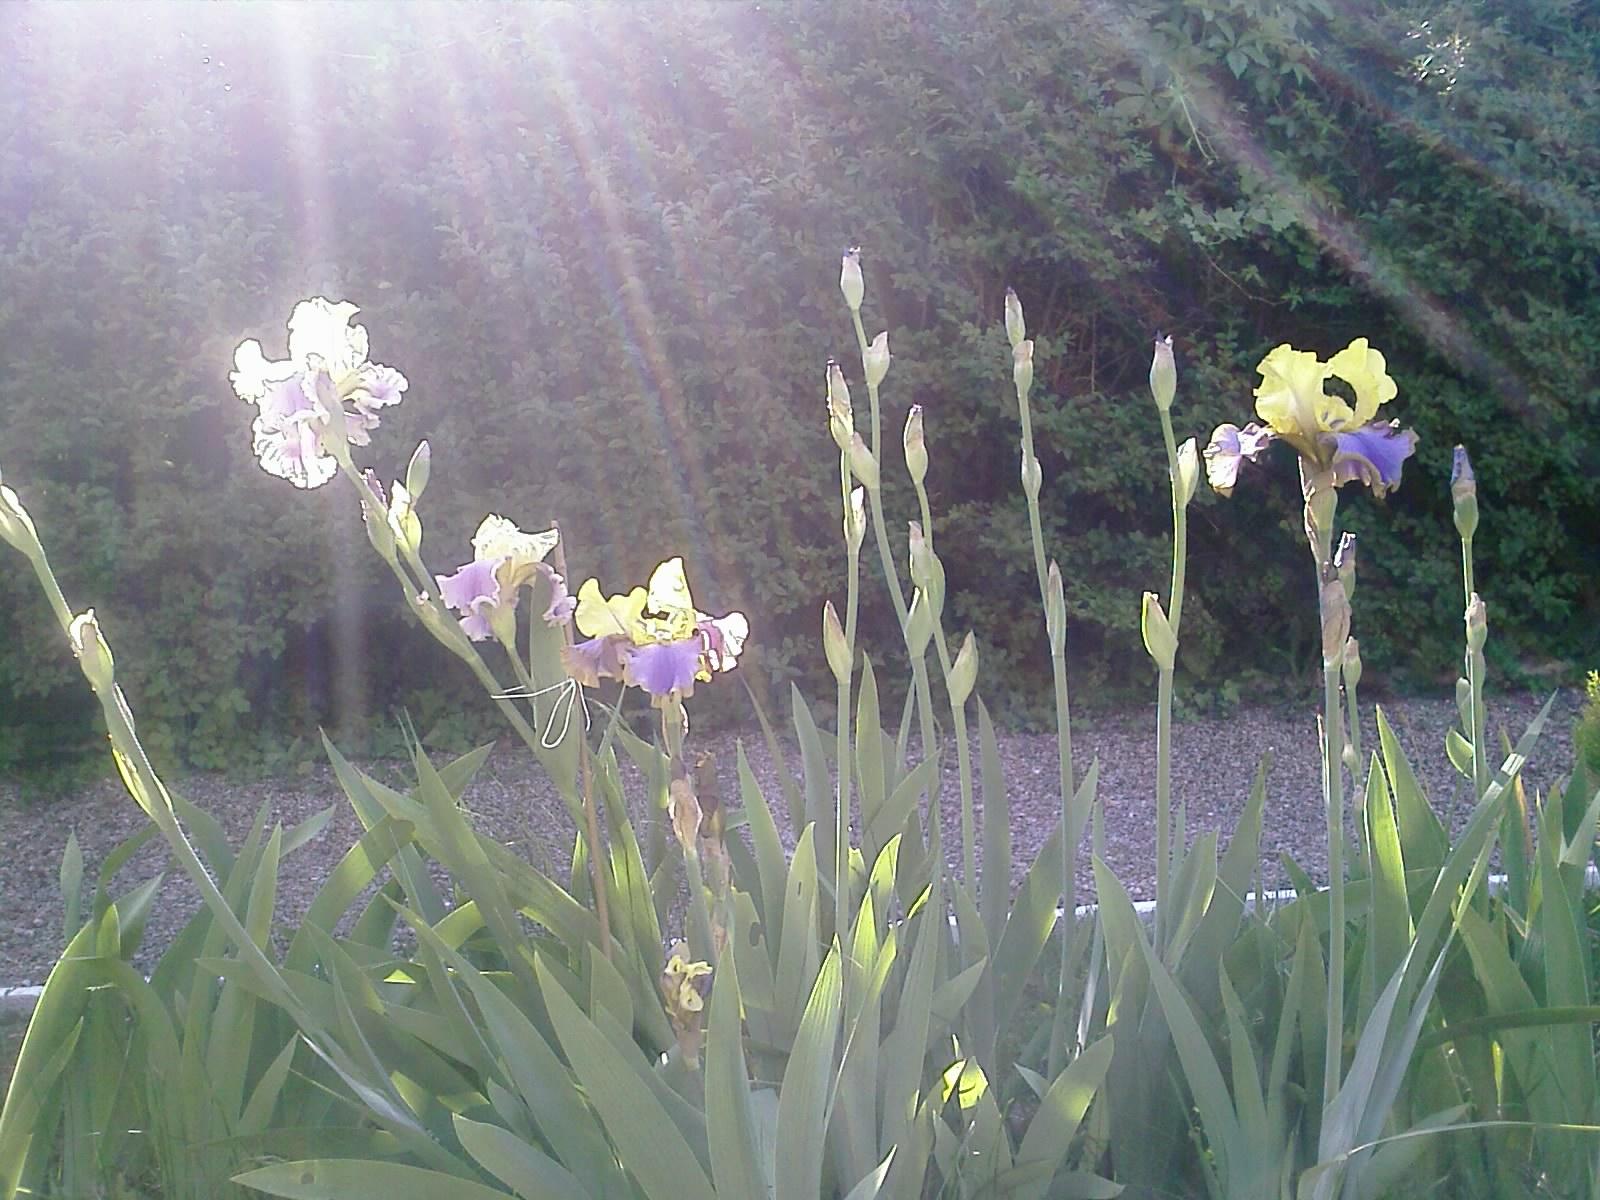 Iris au Soleil